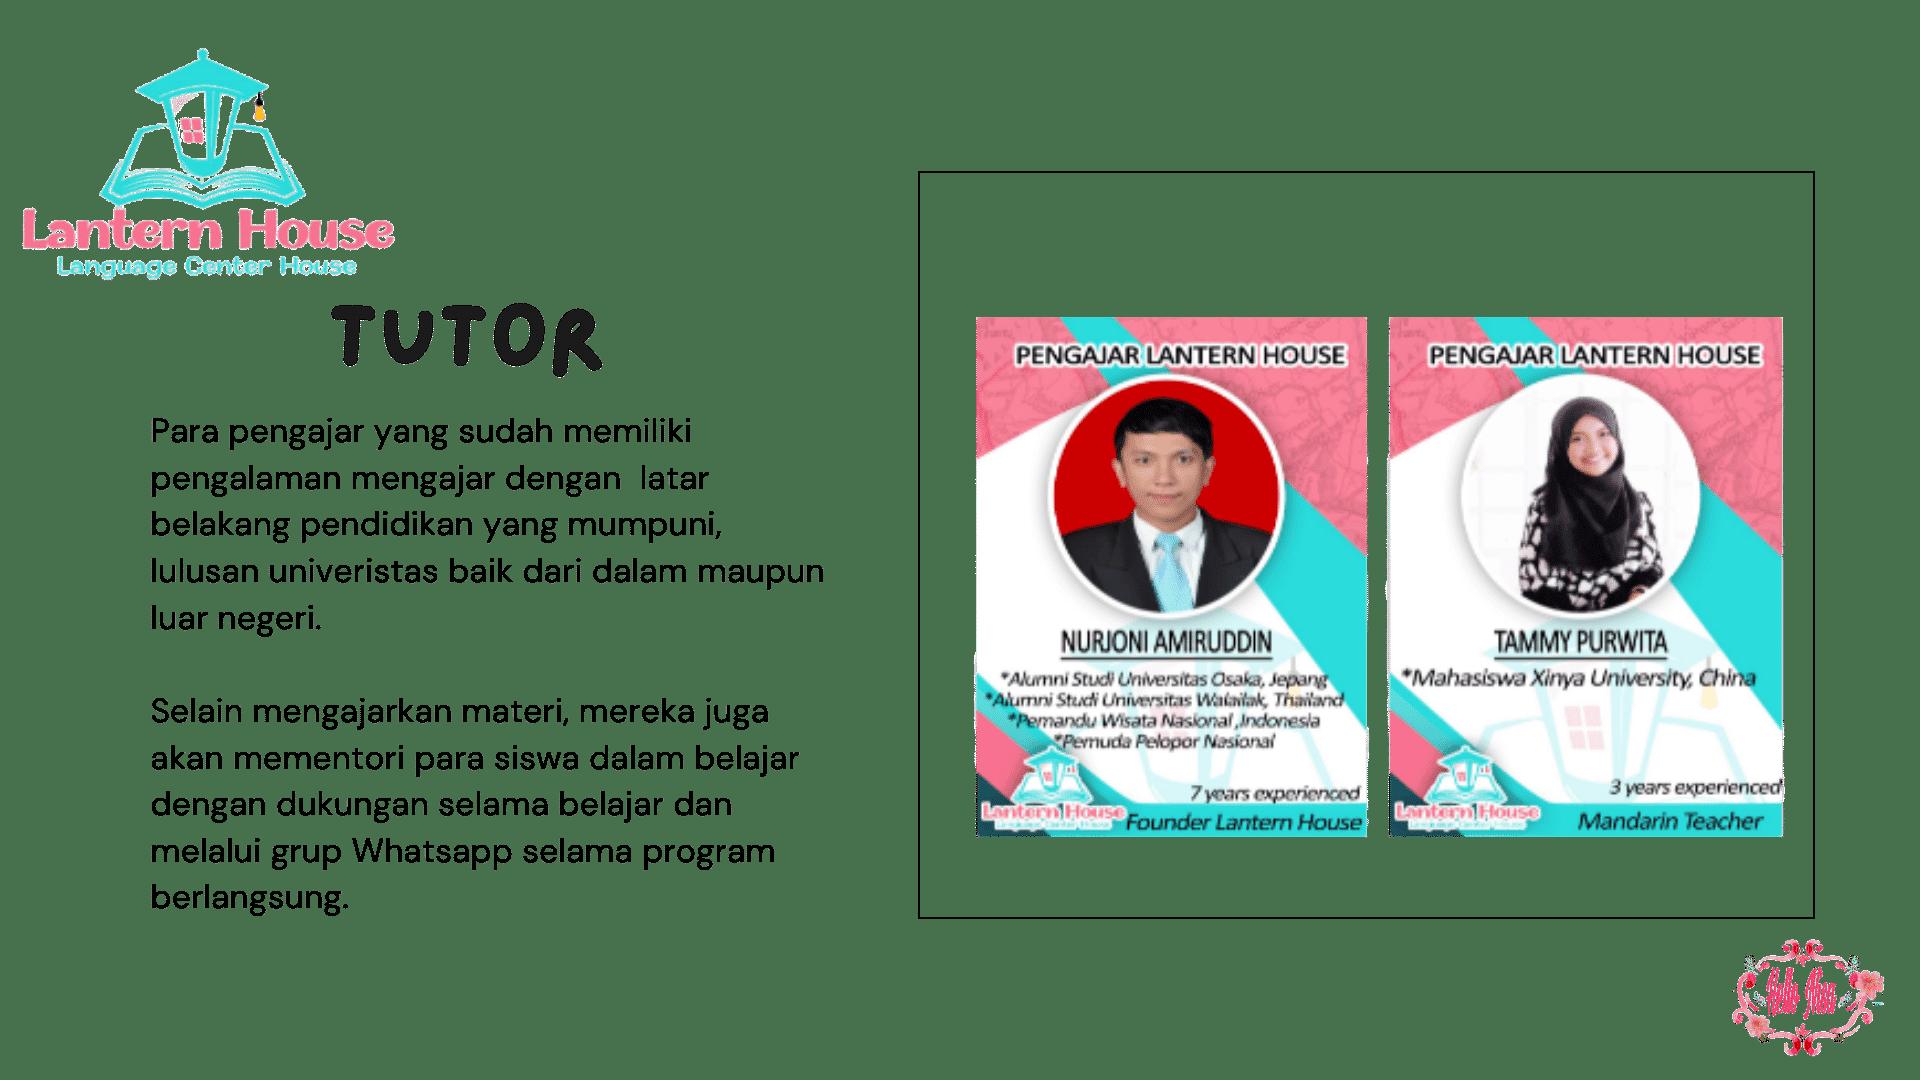 tutor-lantern-house